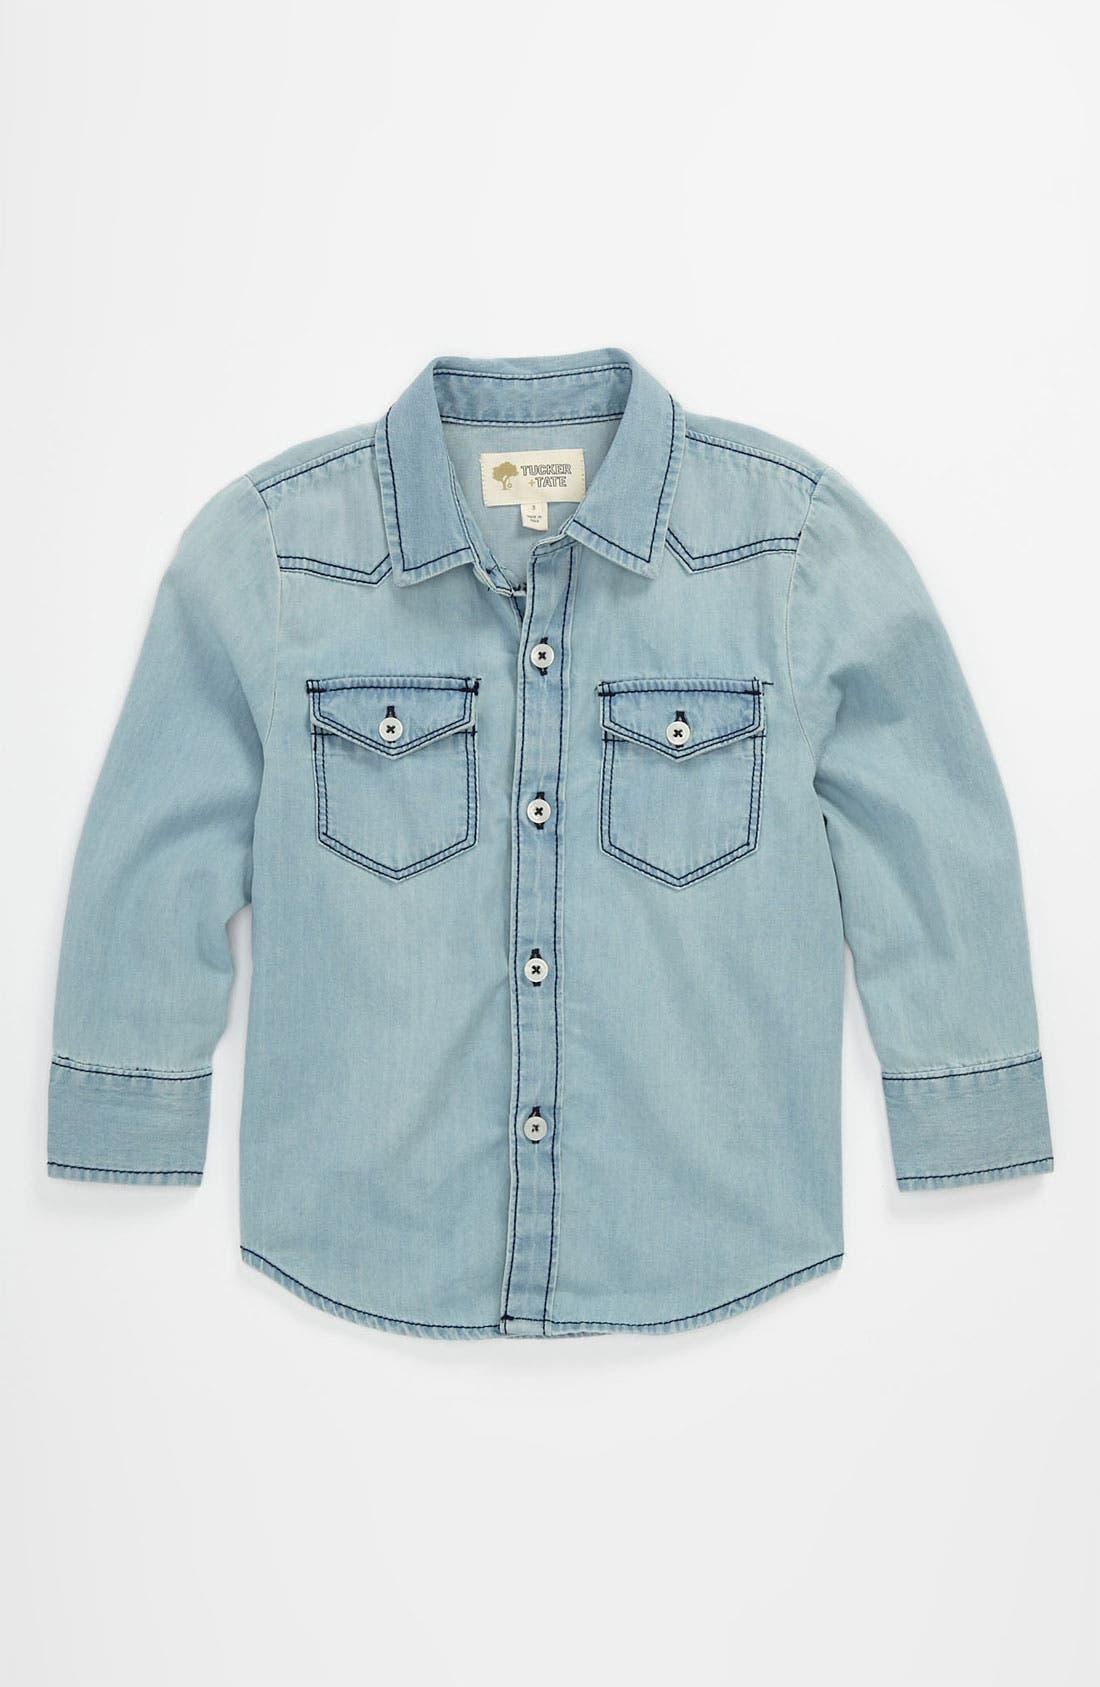 Main Image - Tucker + Tate 'Benson' Denim Shirt (Toddler)